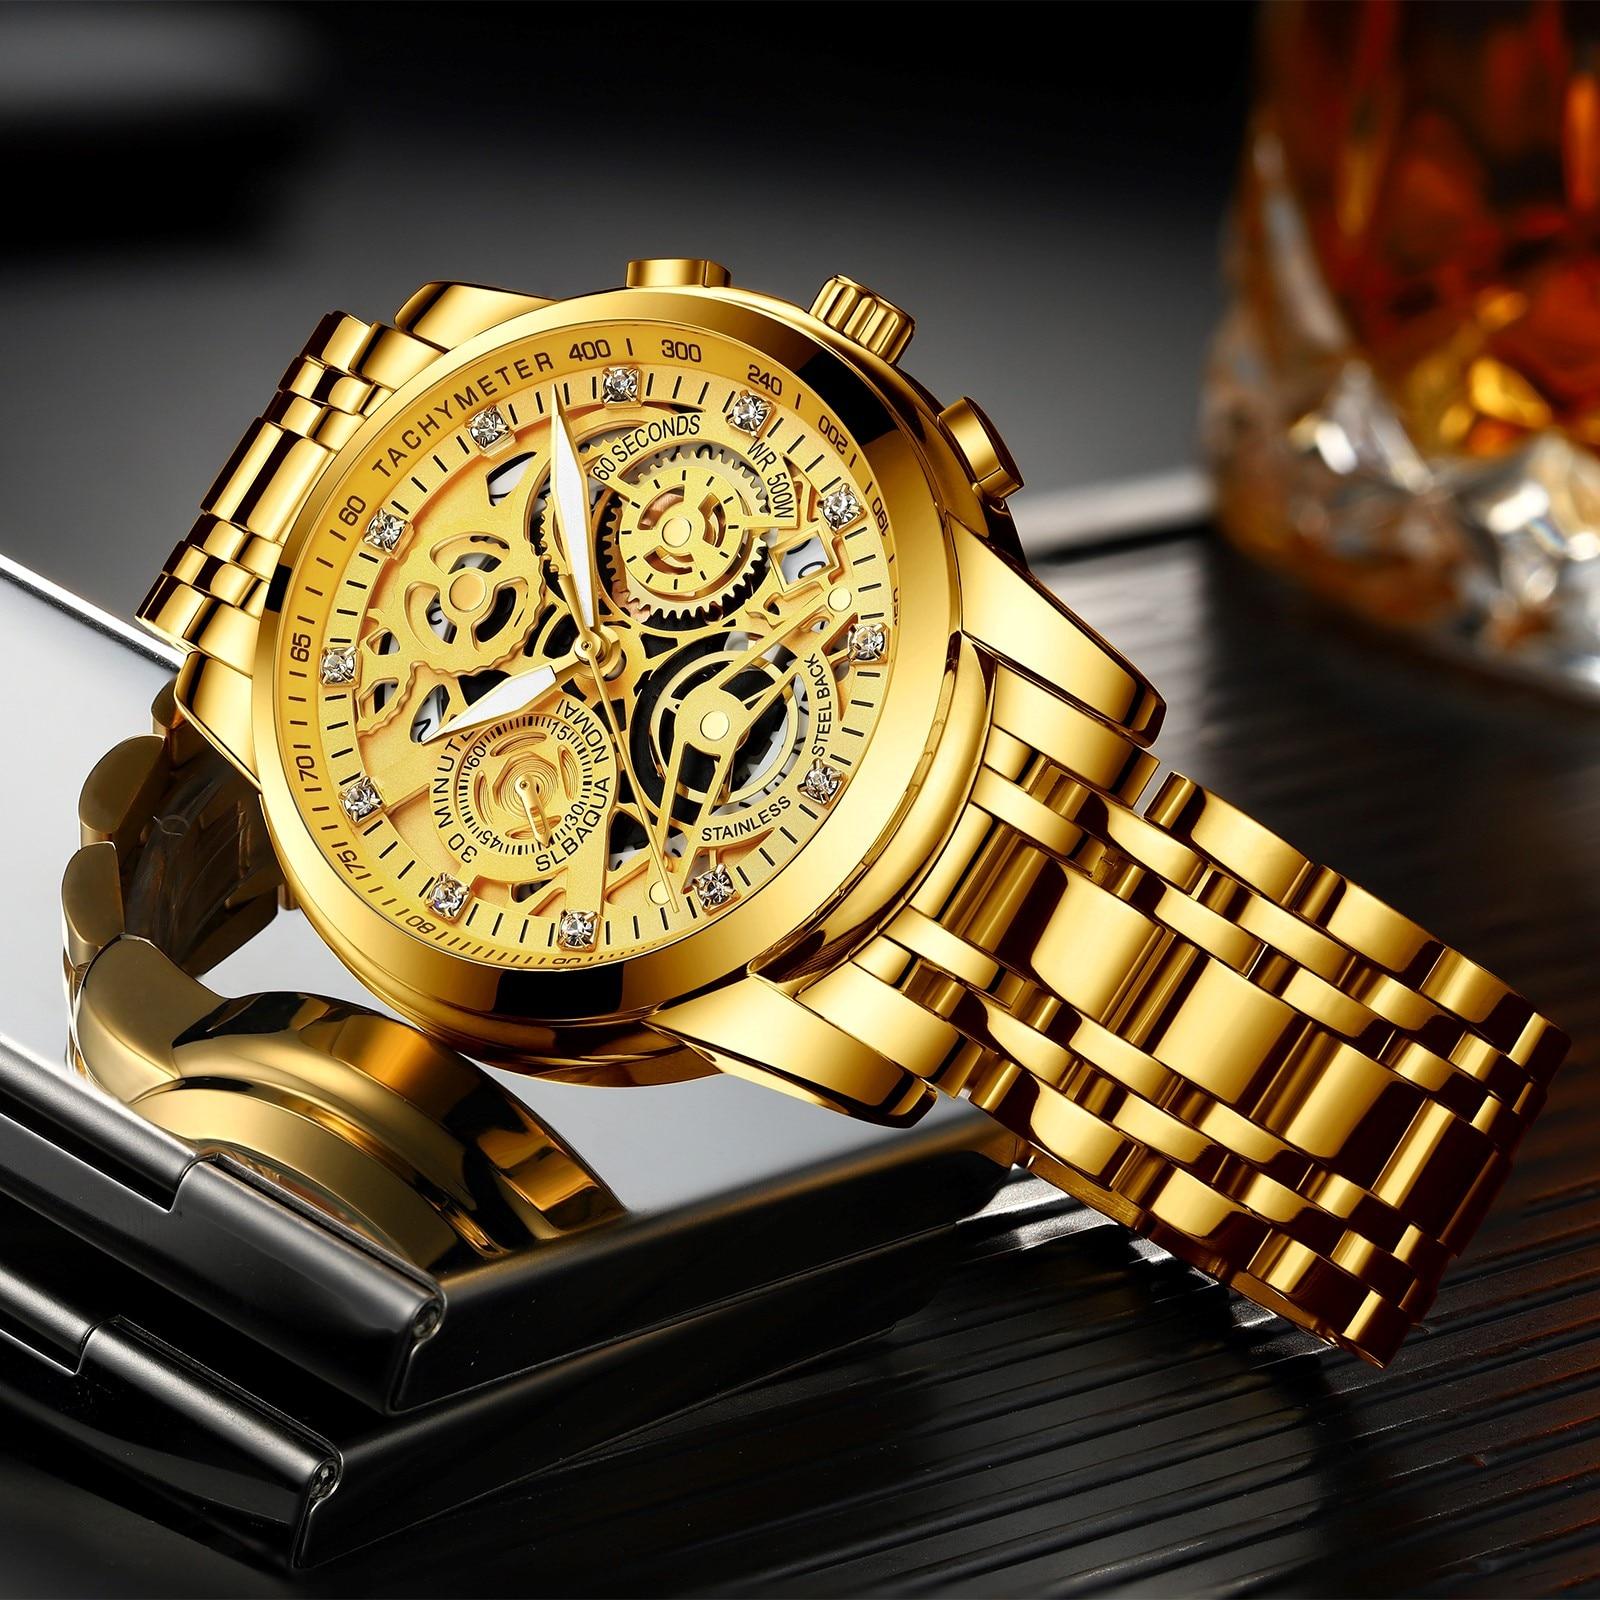 Quartz men watches 2020 Relogio Masculino waterproof watch Fashion male Top brand Gold Luxury Men's Wristwatch For Bussiness Man Men's Accessories Men's Watches cb5feb1b7314637725a2e7: N8202-black|N8202-Golden|N8202-Golden White|N8202-Silver